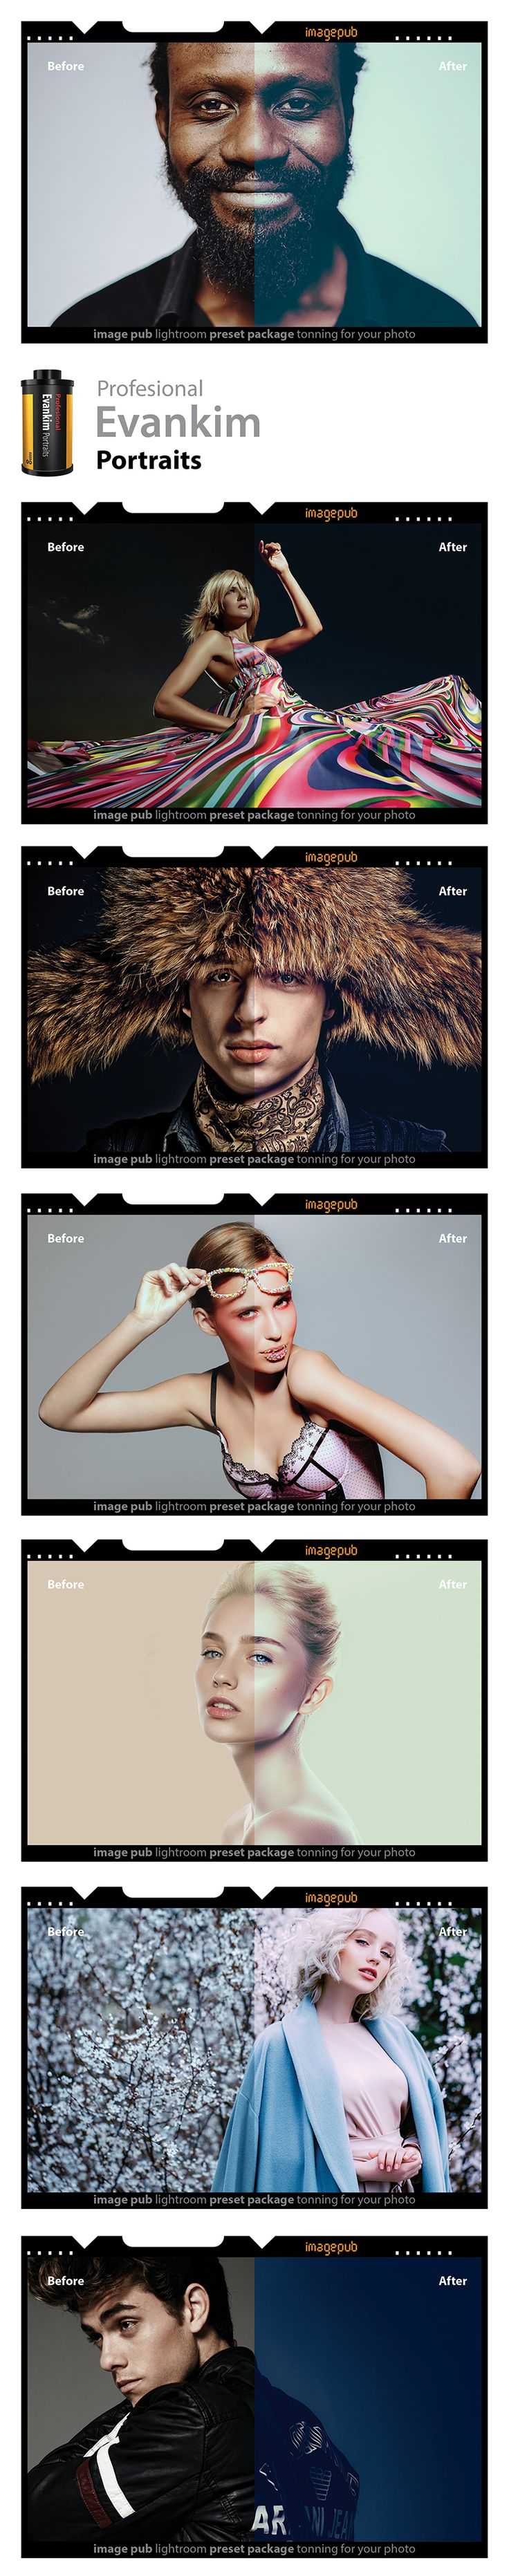 Portrait presets from Art Director Evankim.  Art Director Evankim의 인물사진 프리셋. 잡지, 패션 화보, 광고, 결혼, 파티, 행사 사진 등을 위한 프로 퀄리티 프리셋. 스튜디오나 야외 등에서 기획 촬영된 인물사진에 잘 어울립니다. 대형인화에서도 퀄리티가 유지되는 프로 퀄리티 프리셋.